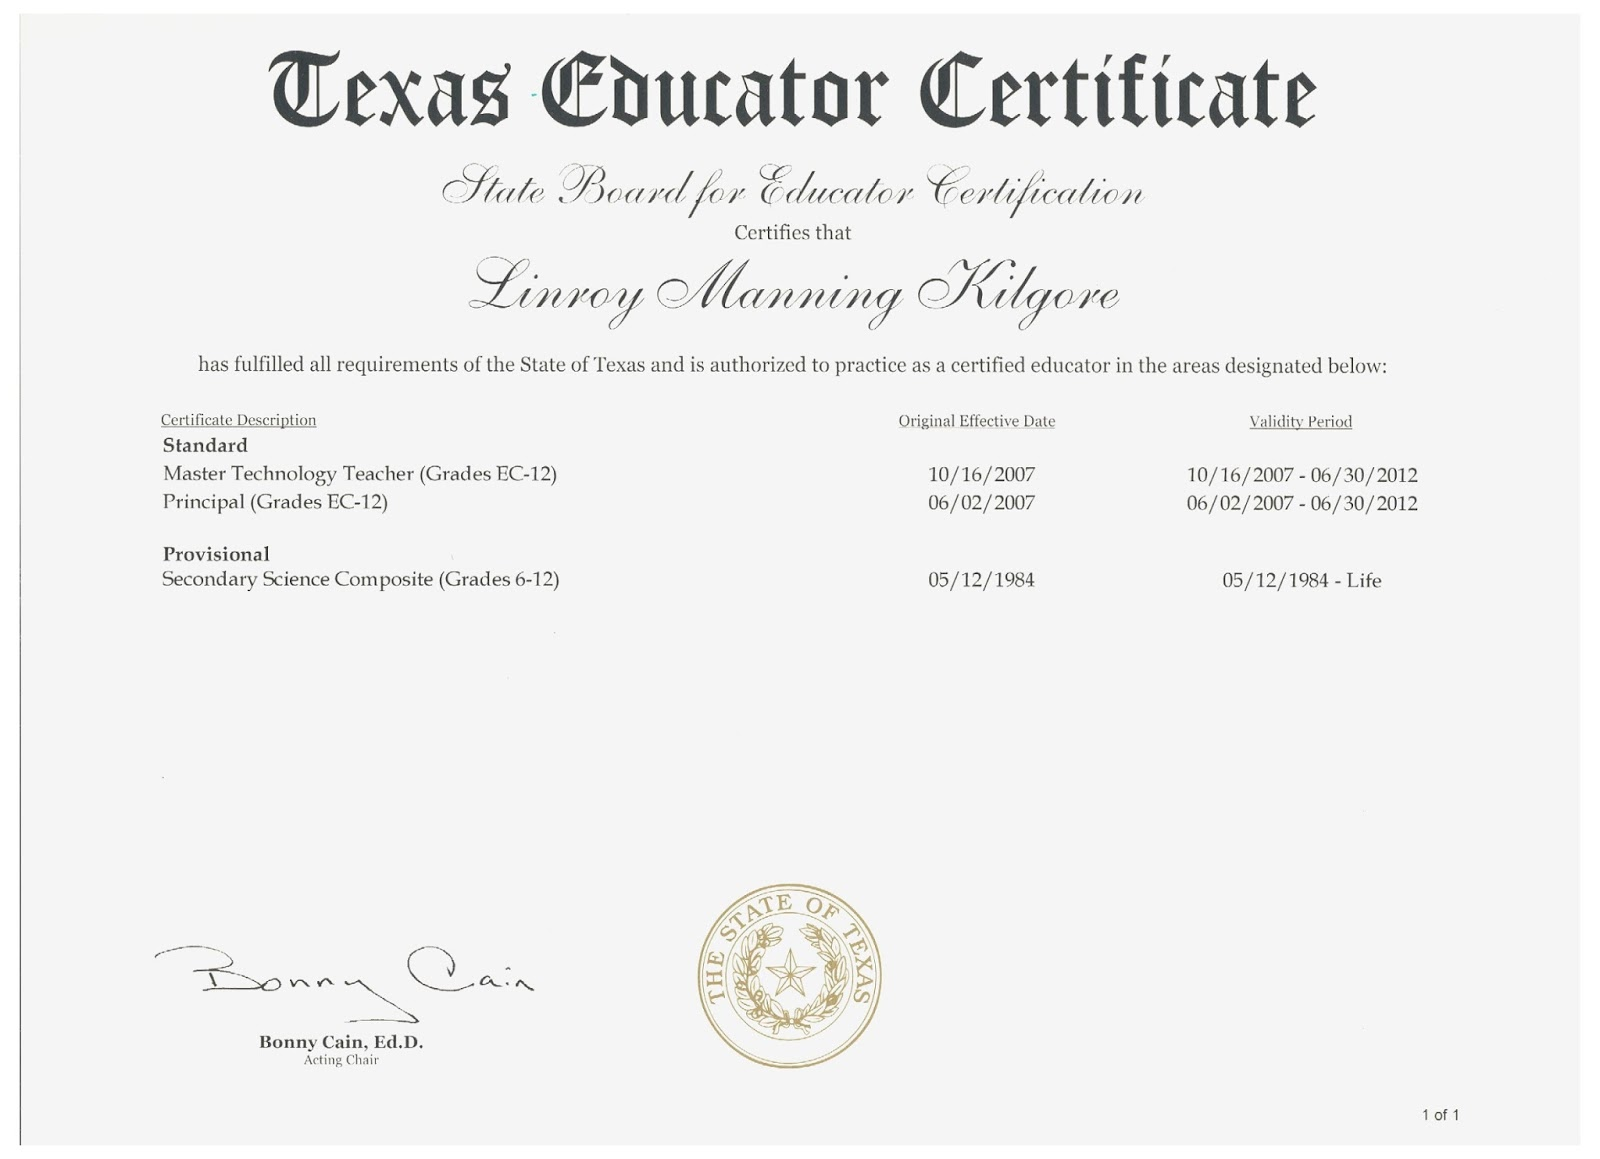 Examples of best certificate texas teacher certification tr71 texas teacher certification tr71 xflitez Images